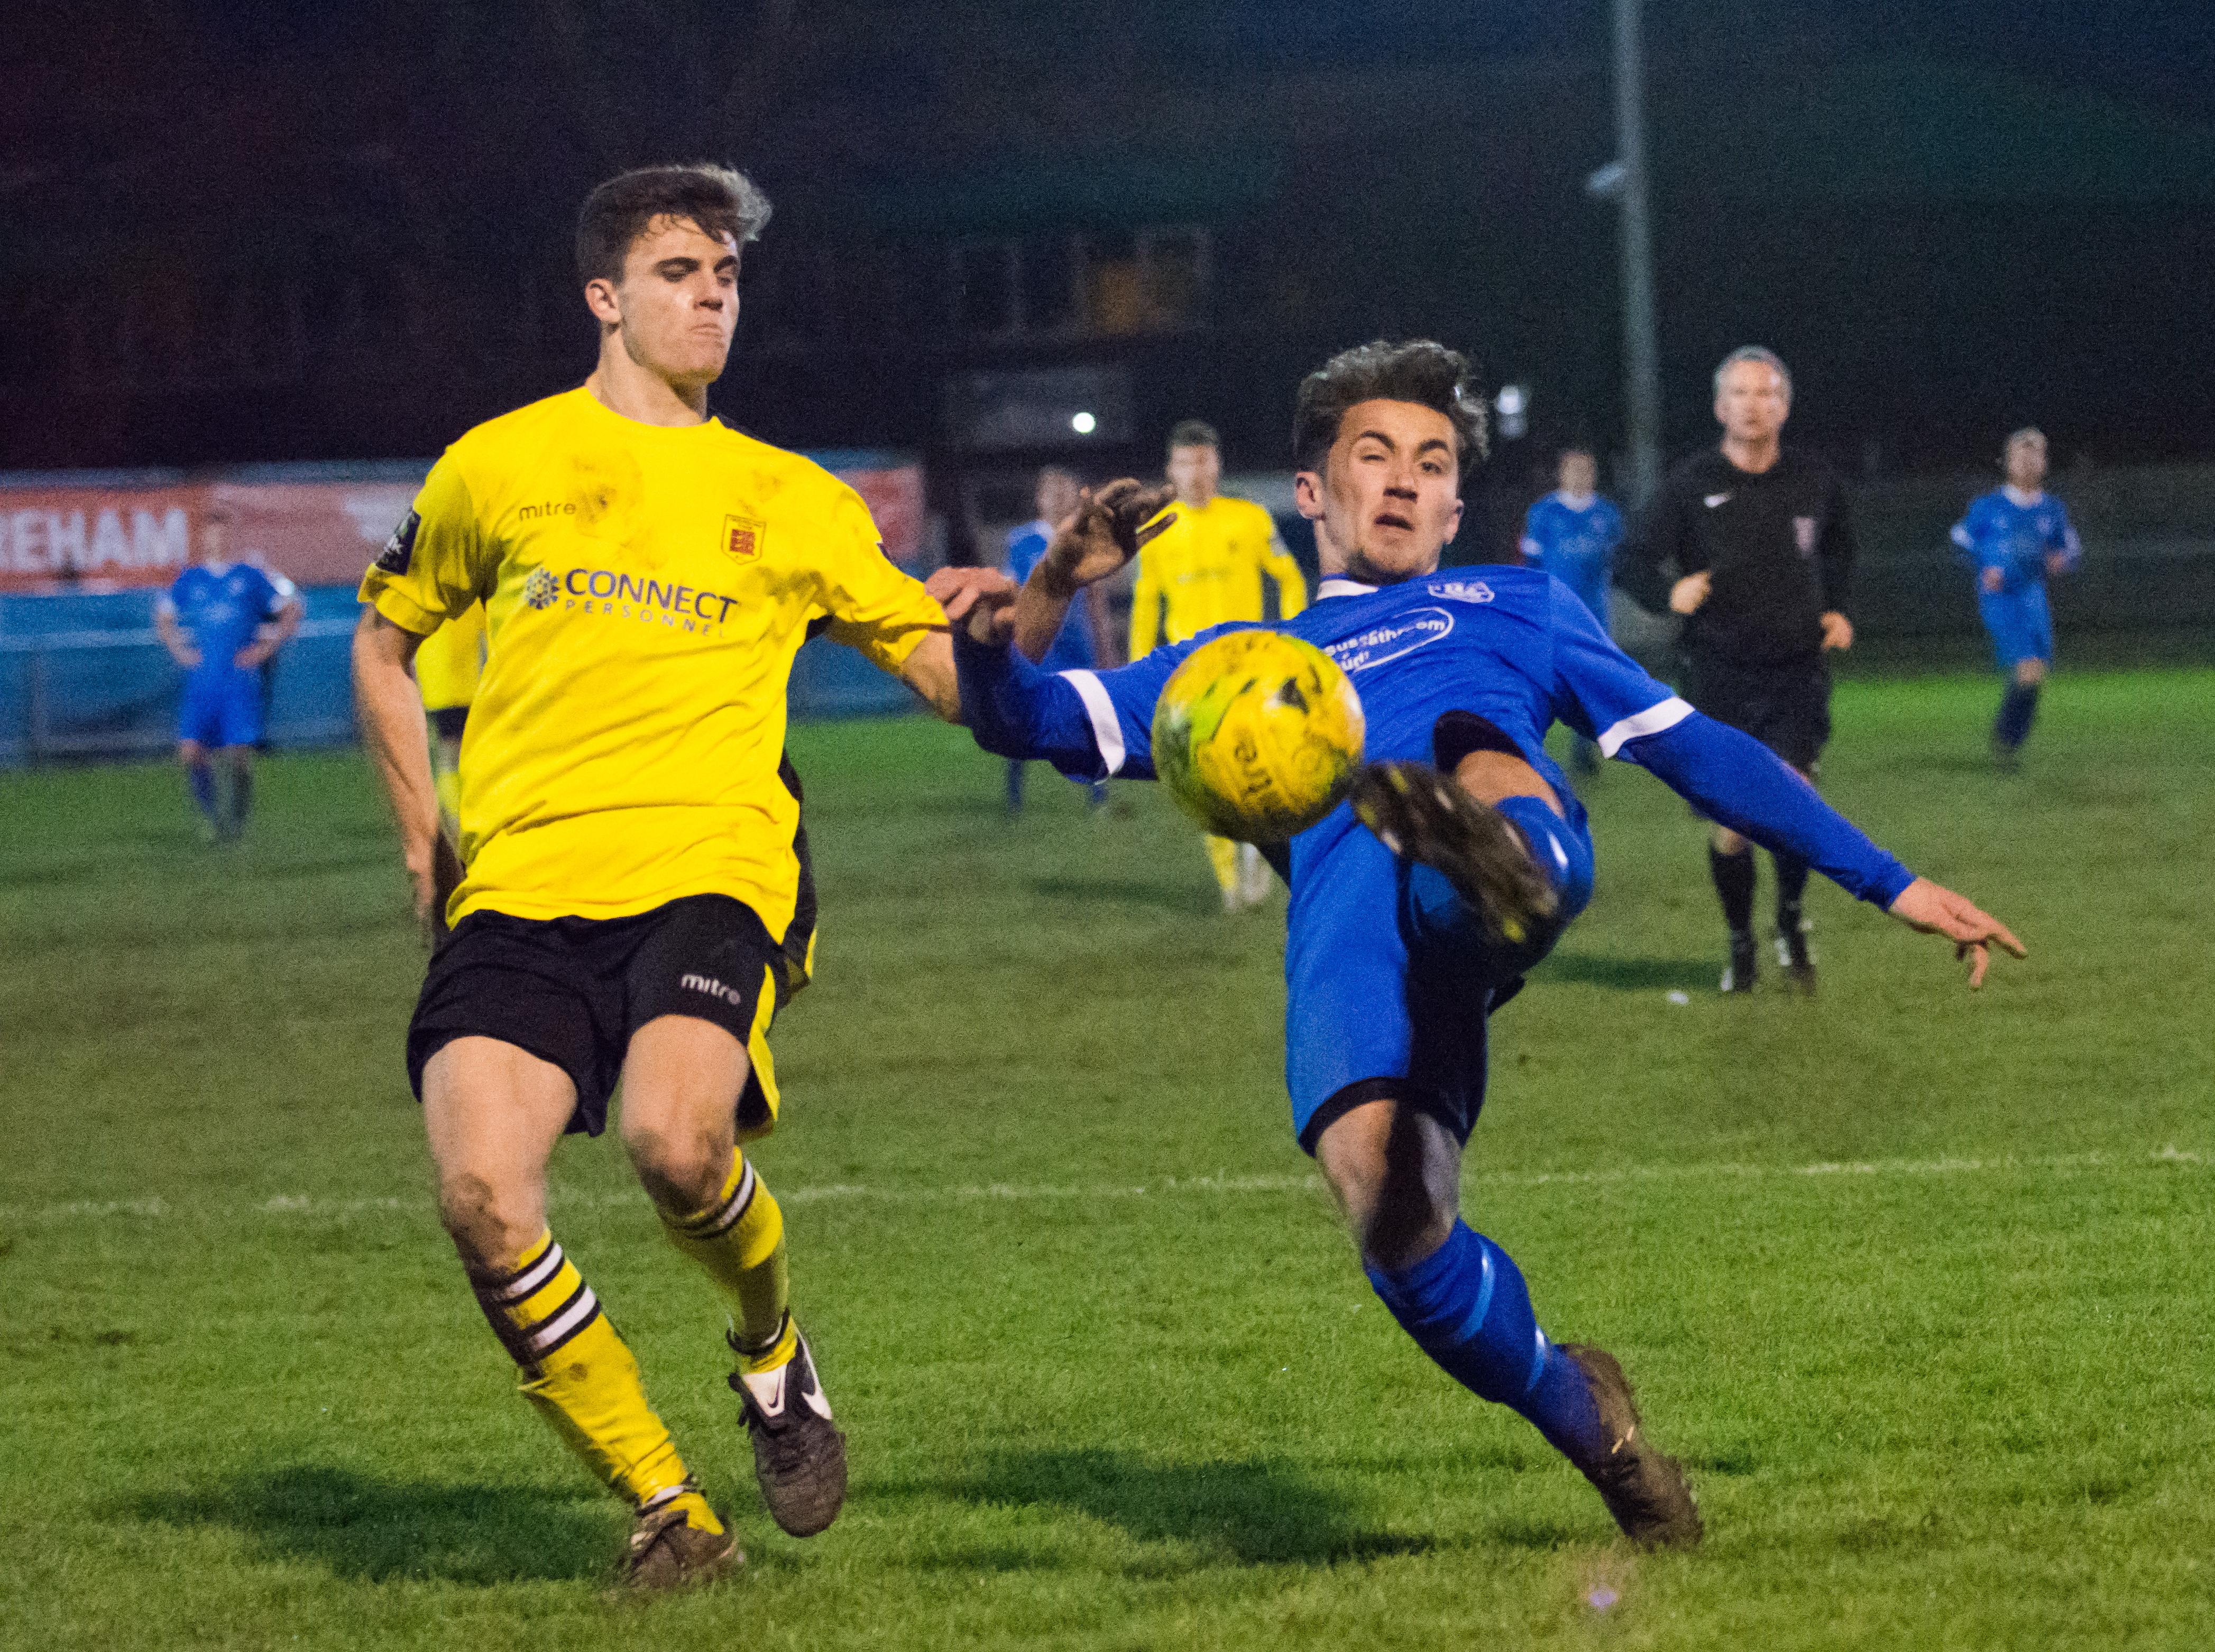 Shoreham FC vs Faversham Town 16.12.17 60